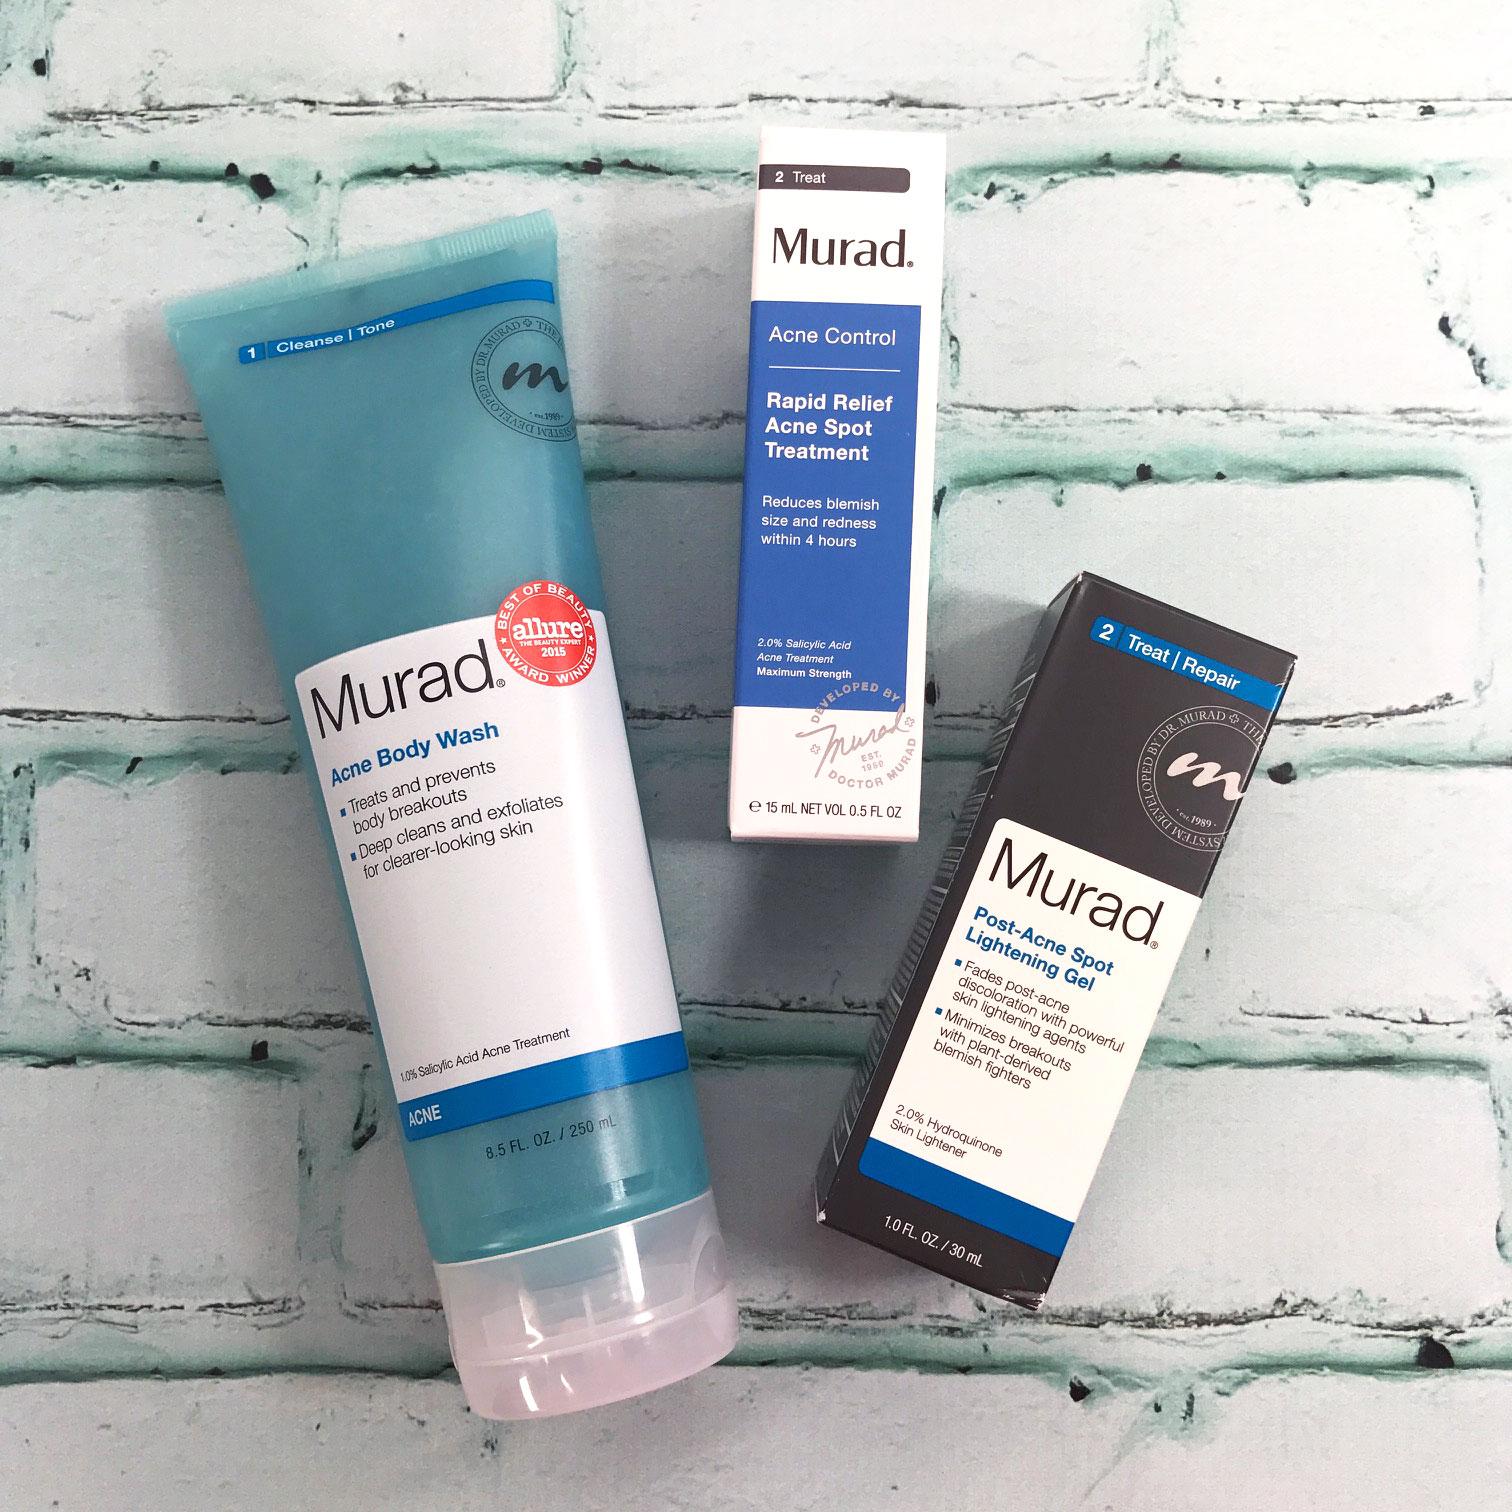 Murad Acne Body Wash, Murad Rapid Relief Acne Spot Treatment, Murad Post-Acne Spot Lightening Gel.